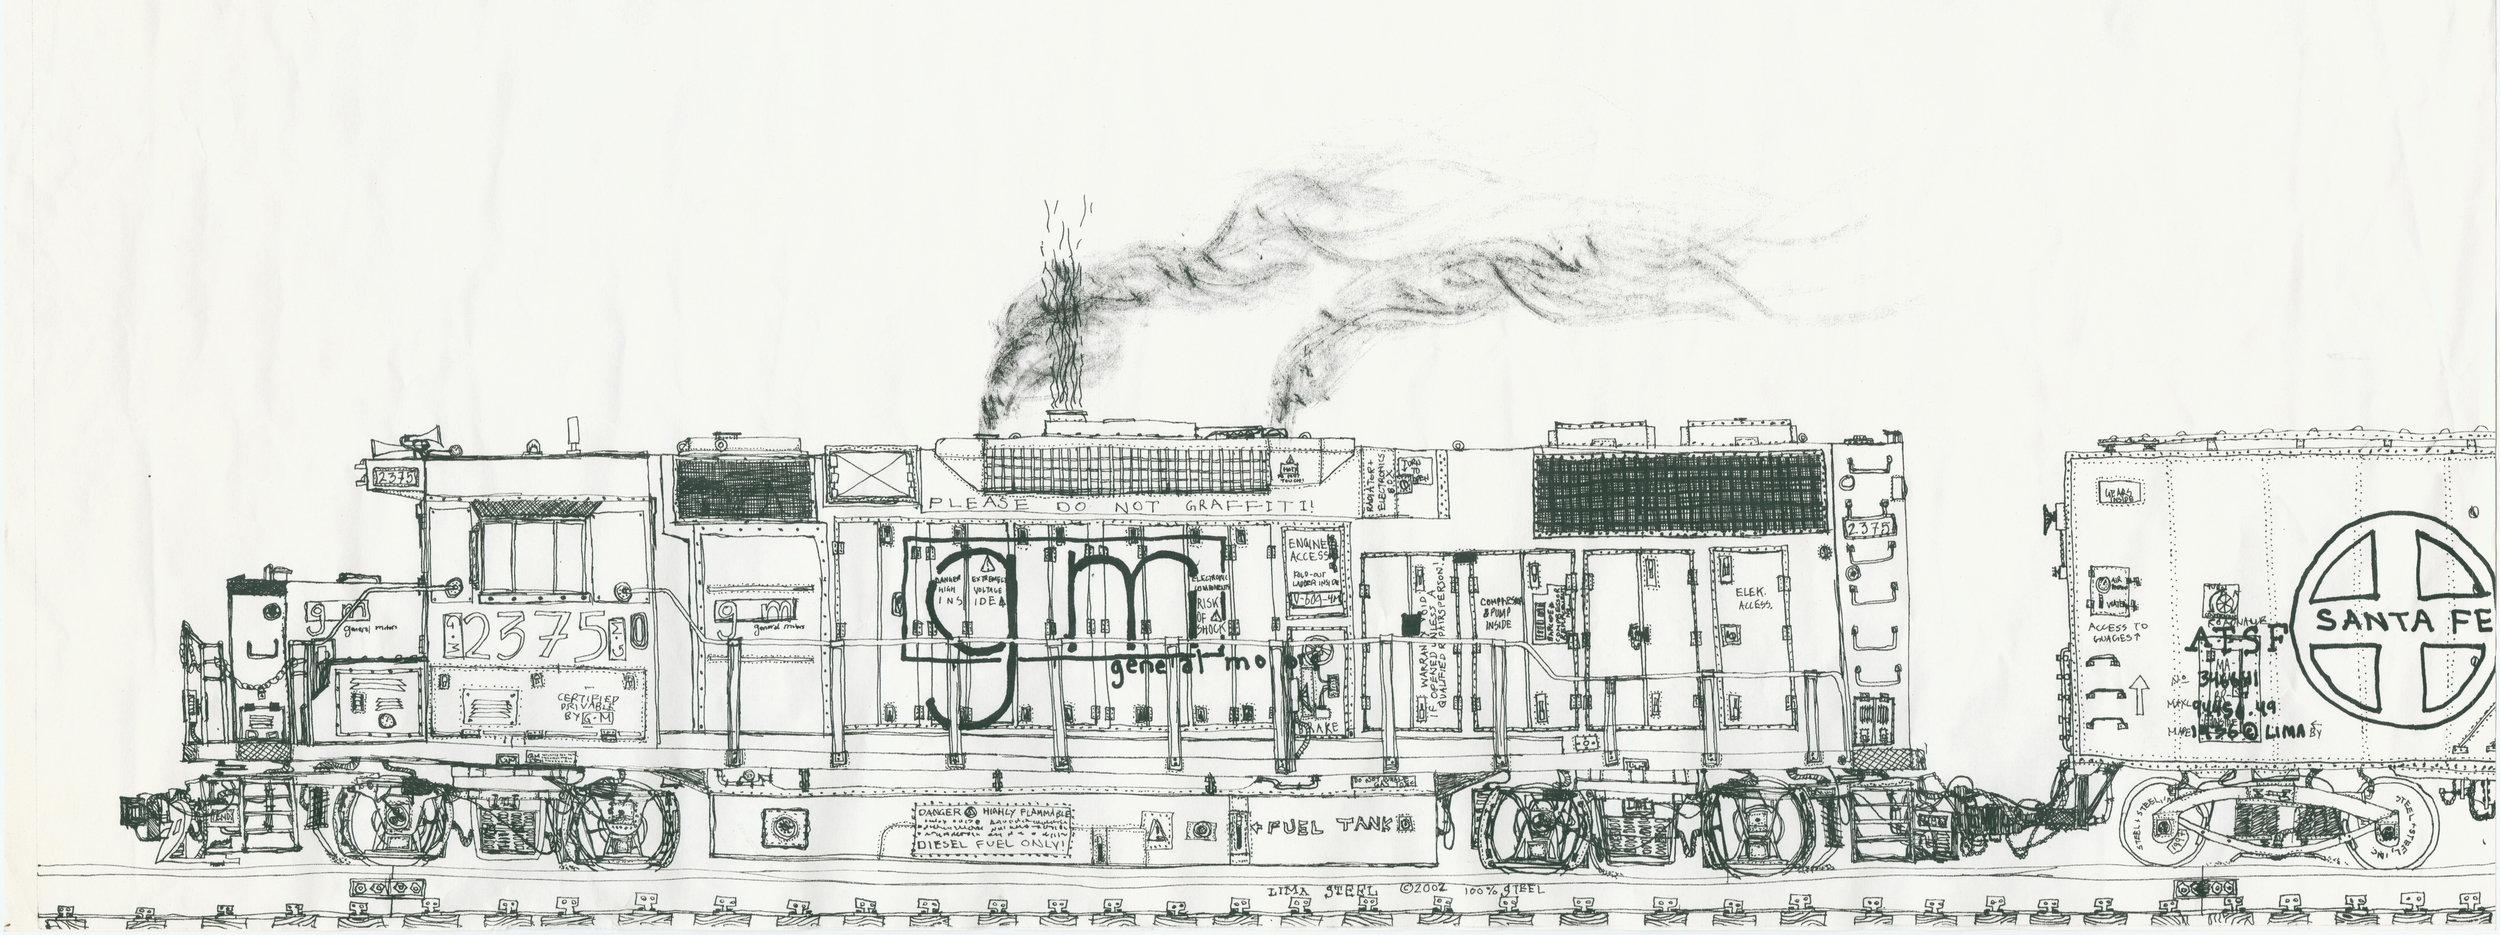 2003.03.10 - 001 - GM train.pdf0000.jpg